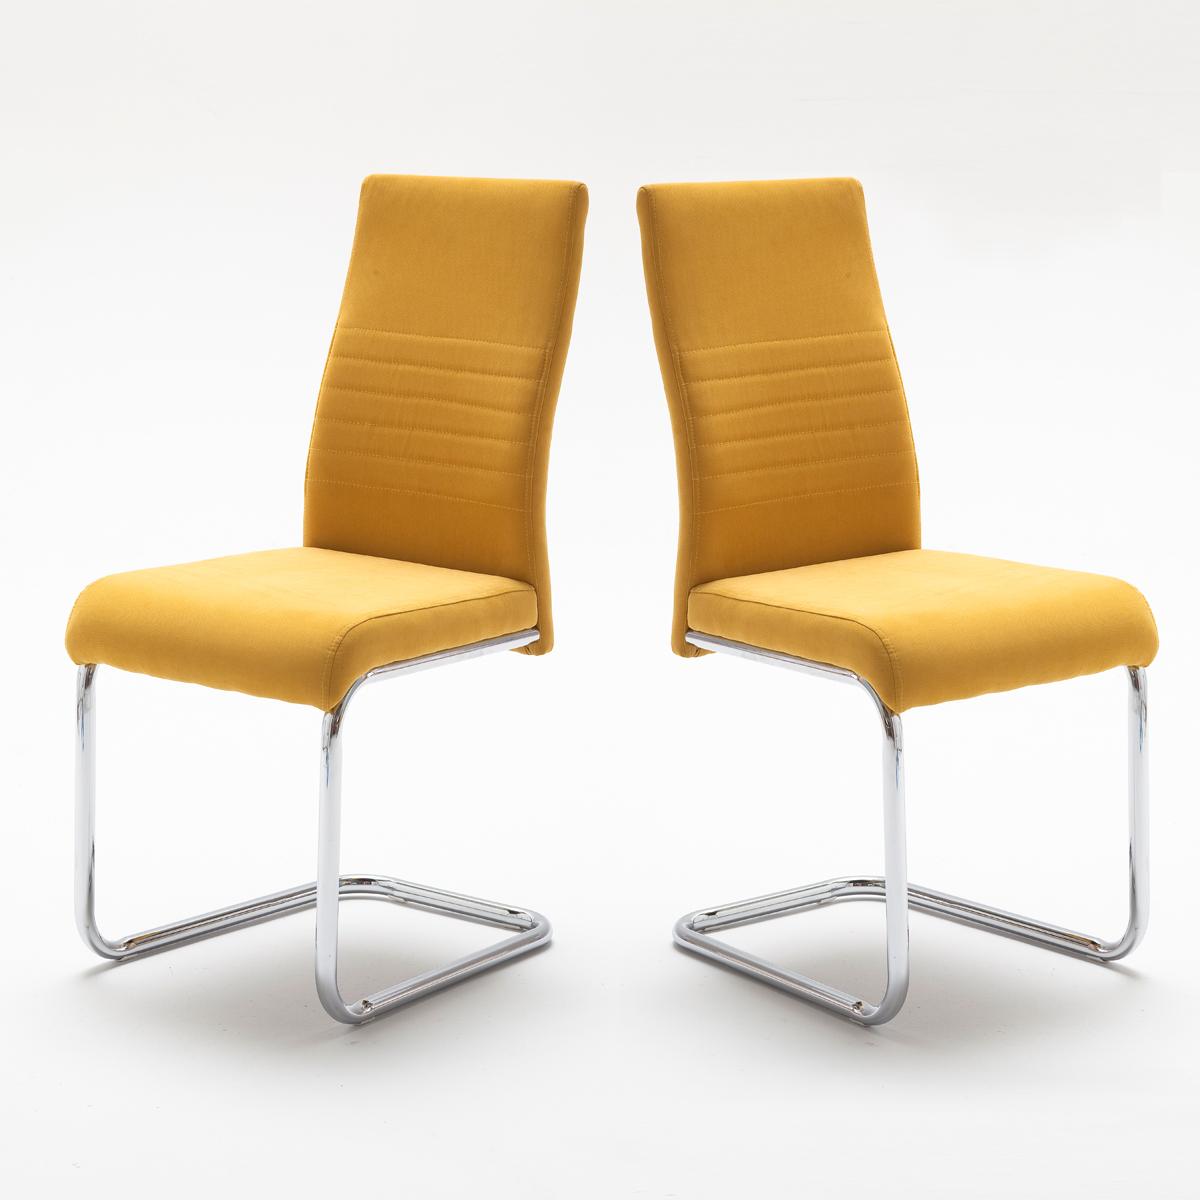 schwingstuhl 4er set jonas esszimmerstuhl stuhl in curry gelb und chrom ebay. Black Bedroom Furniture Sets. Home Design Ideas